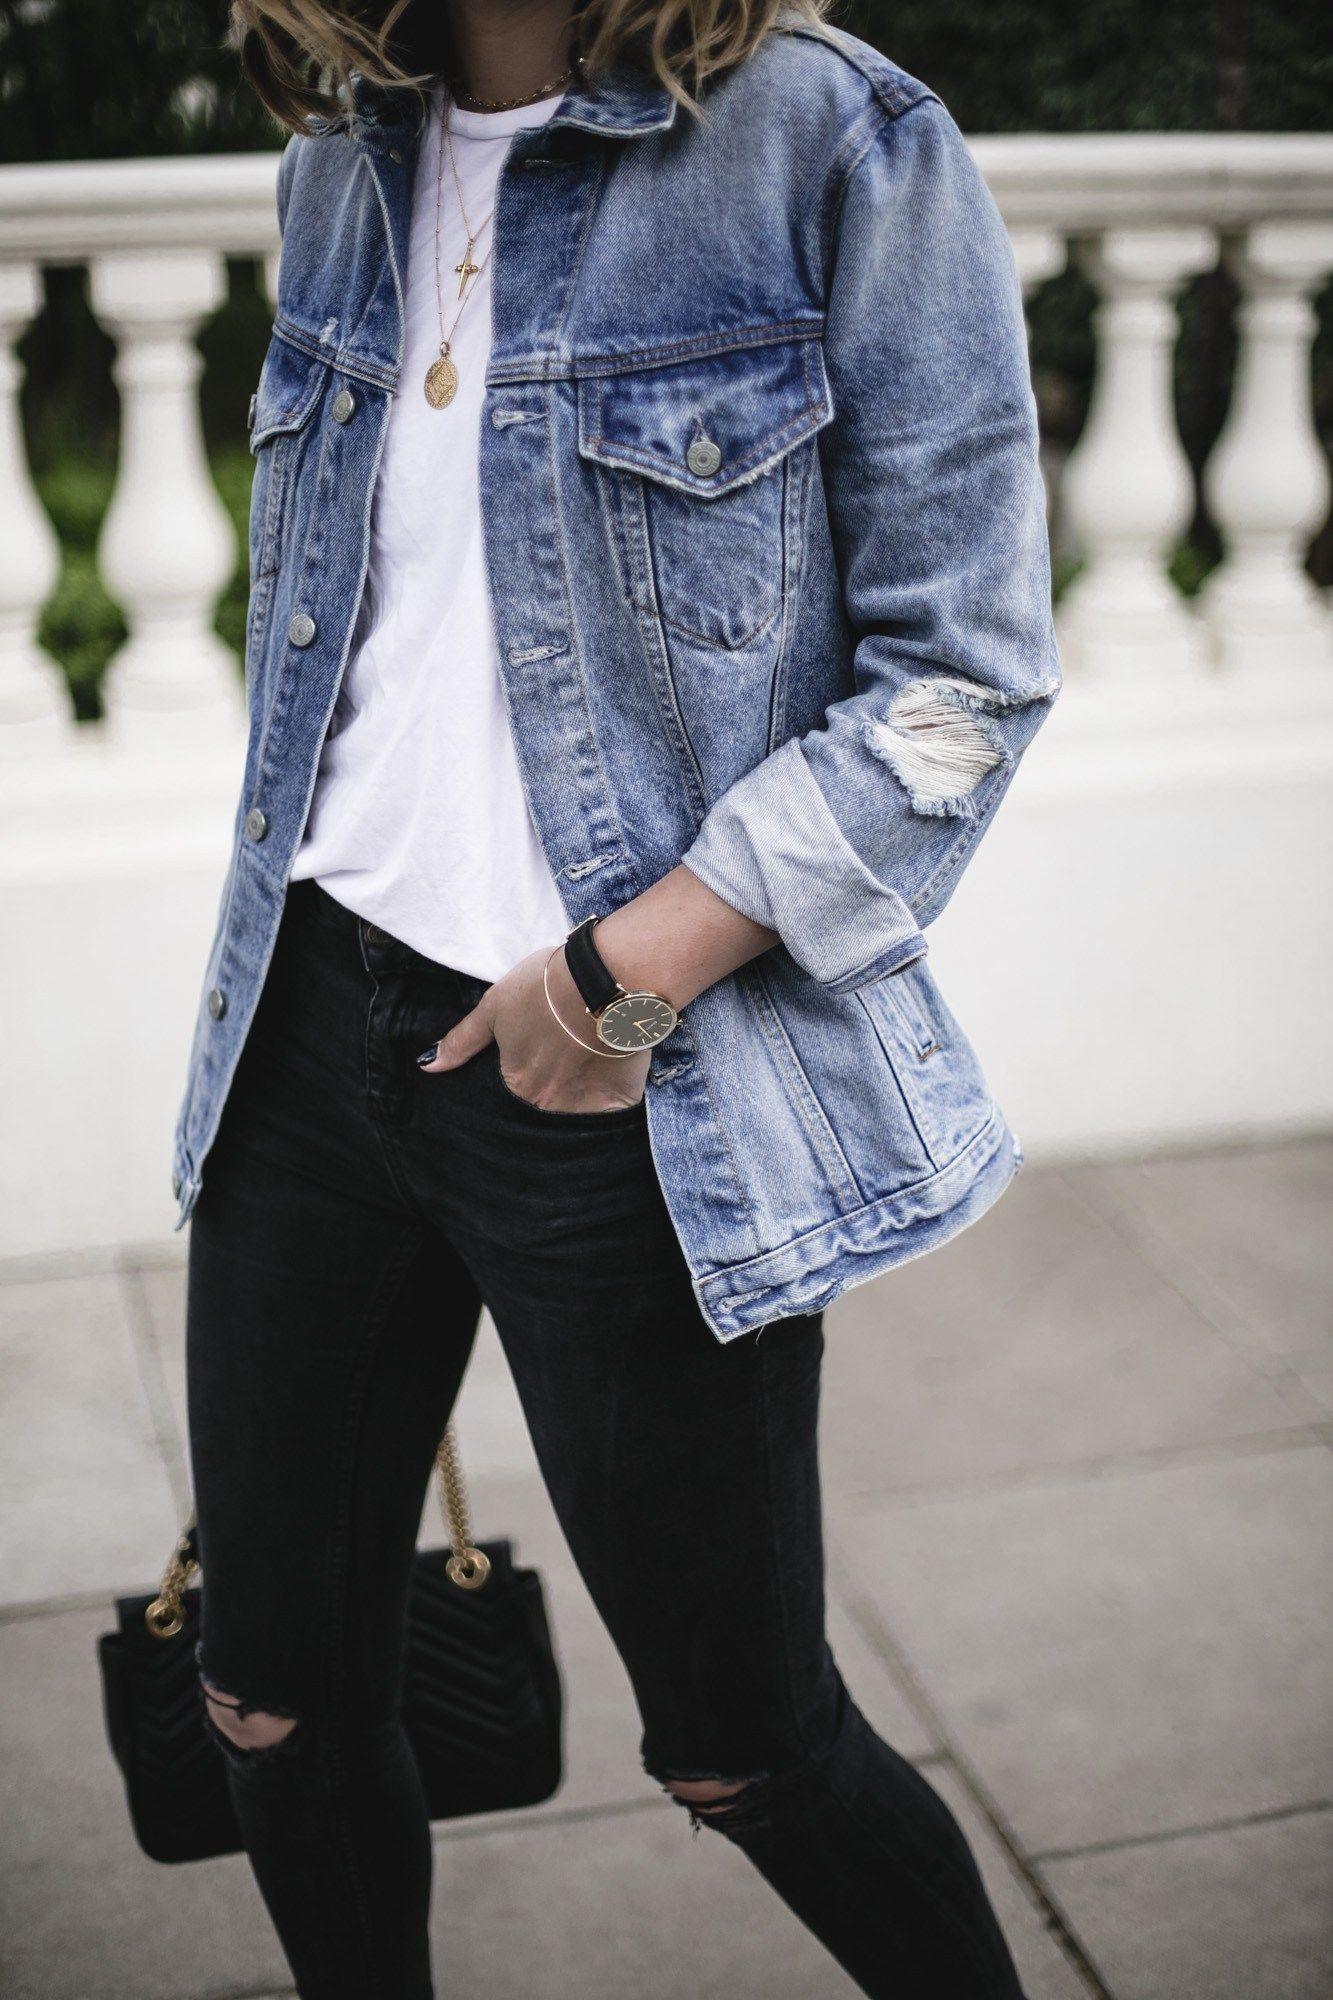 Emma Hill Wears Grlfrnd Oversized Denim Jacket White T Shirt Black Skinny Jeans Gold Jewell Blue Jean Jacket Outfits Denim Jacket Outfit Jean Jacket Outfits [ 2000 x 1333 Pixel ]